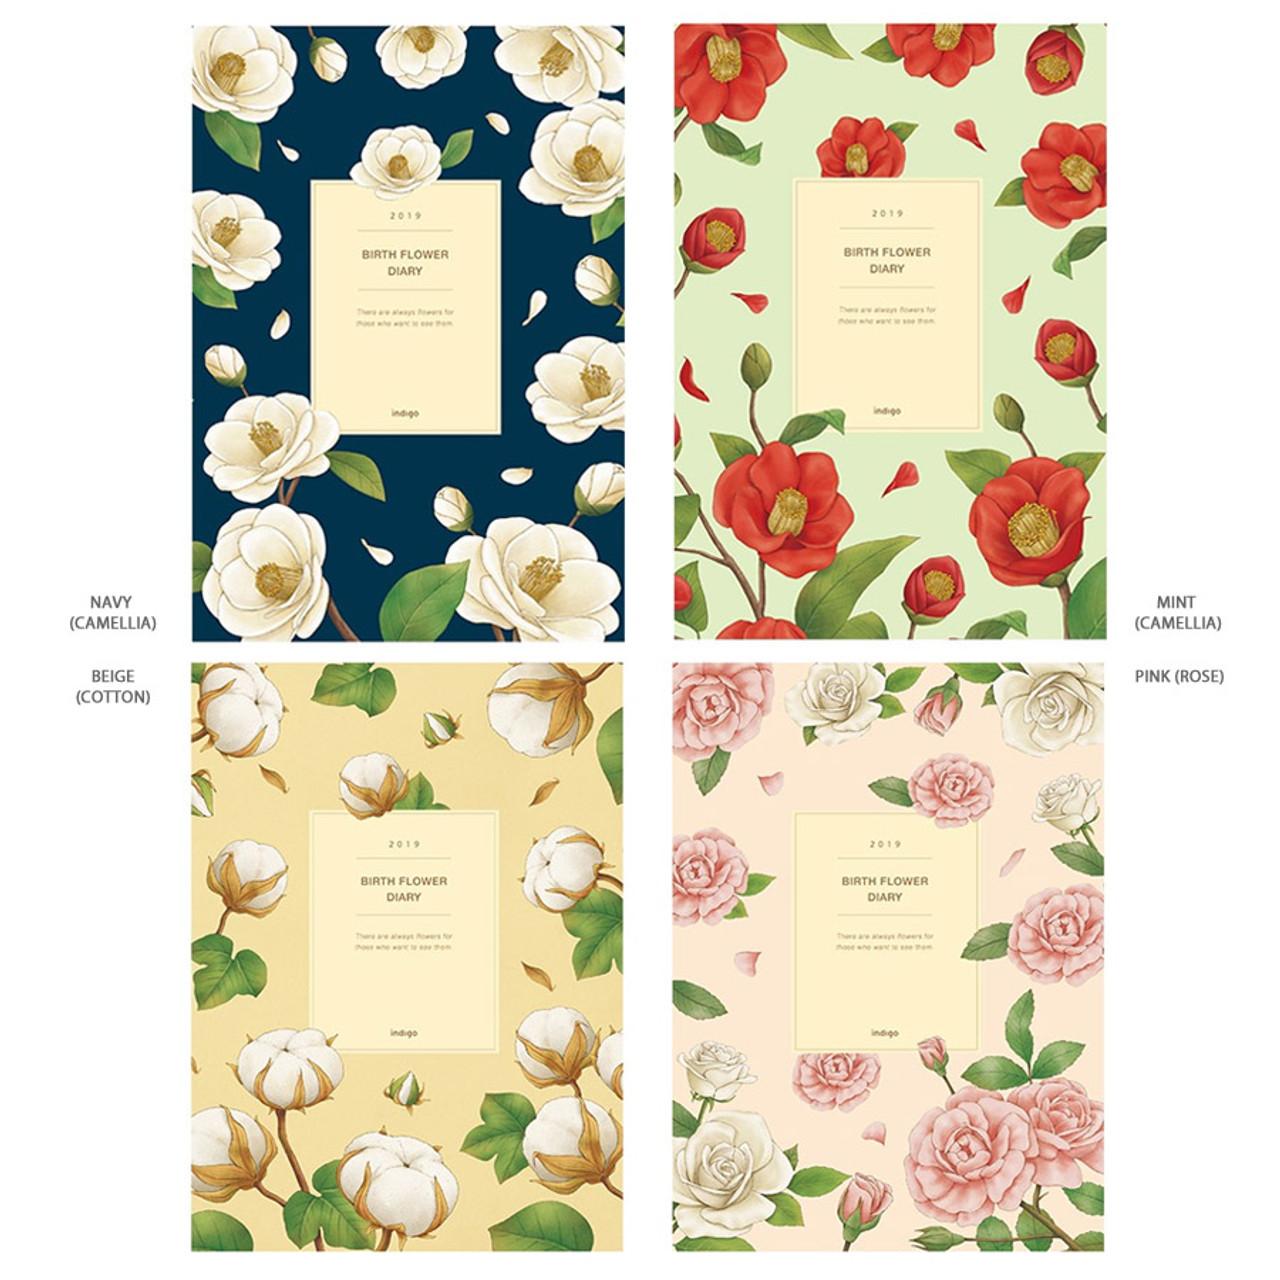 indigo 2019 birth flower hardcover dated weekly diary planner